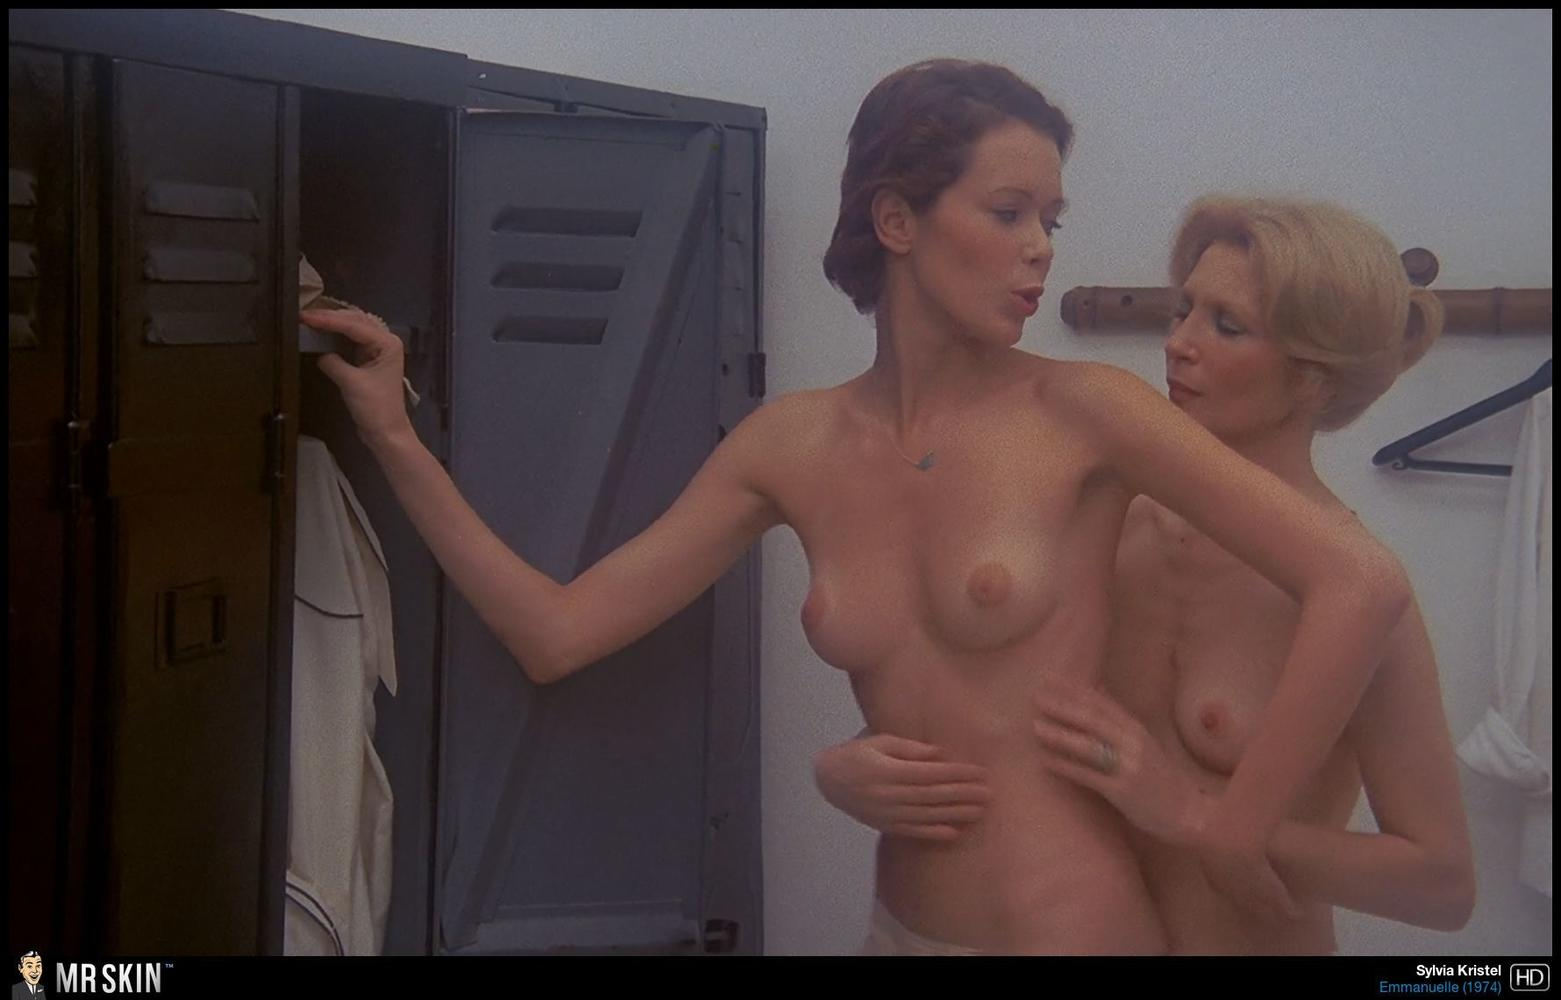 sylvia-kristel-lesbian-nude-red